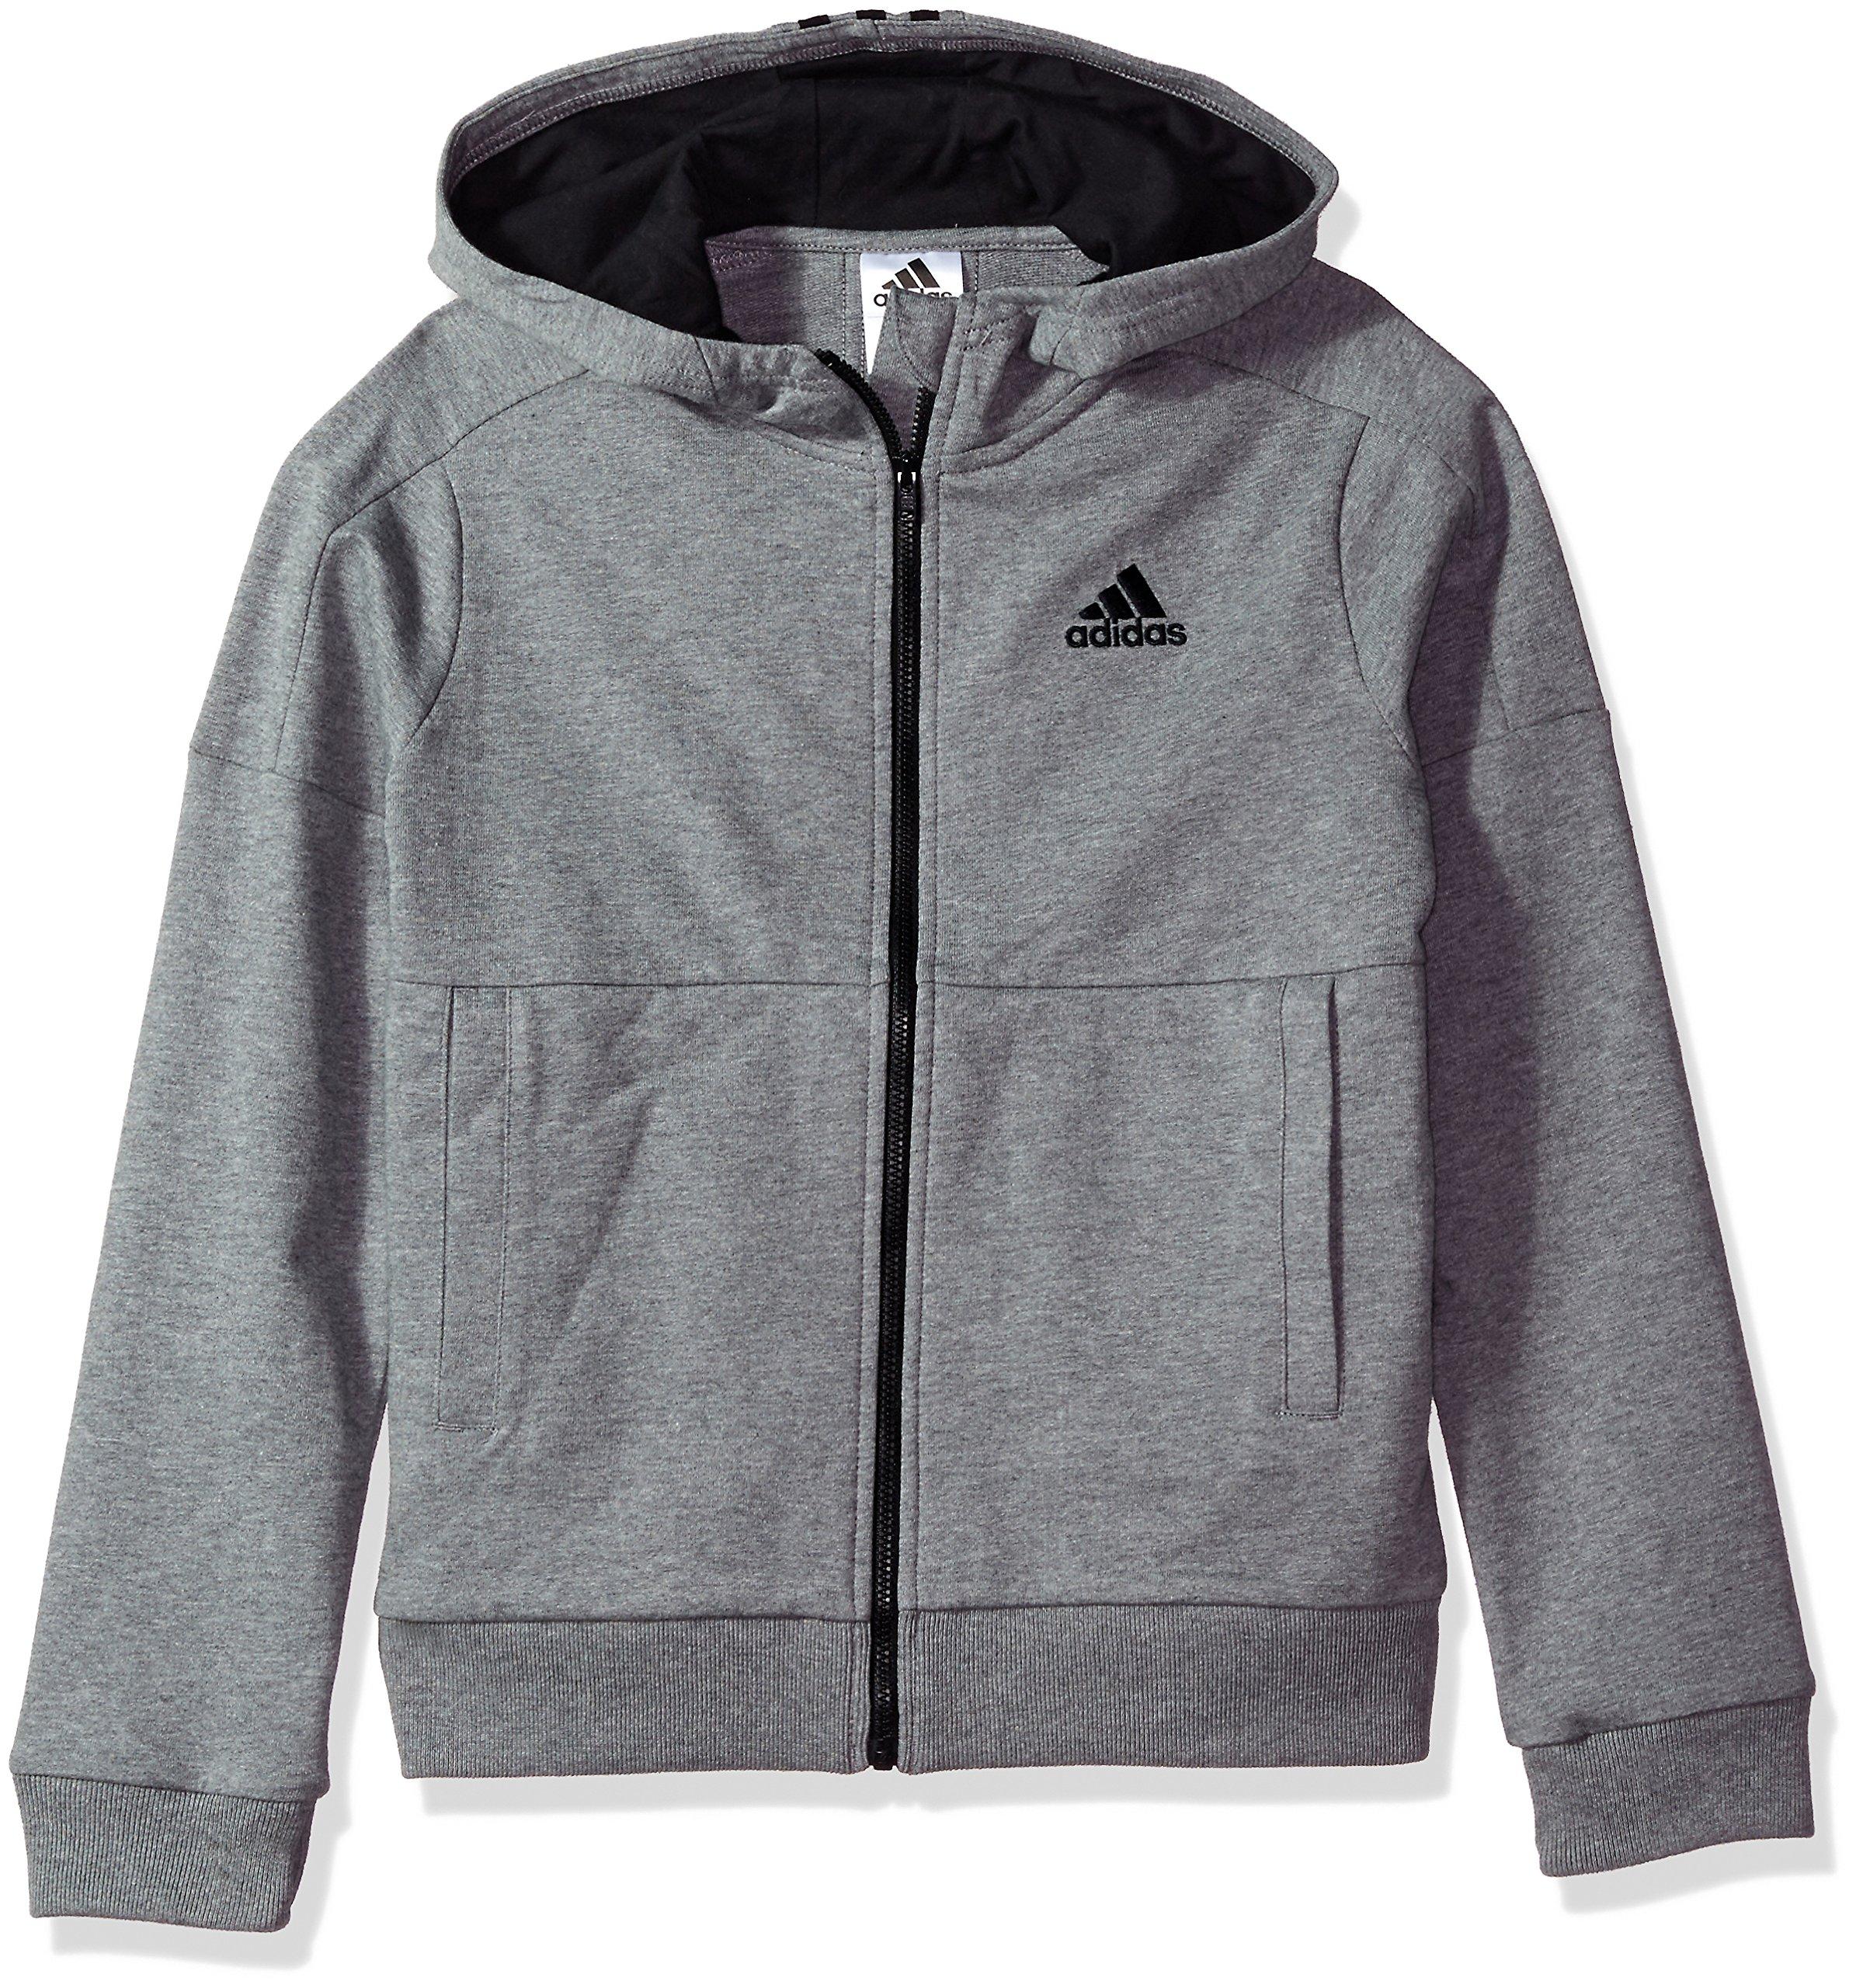 adidas Boys' Big Athletics Jacket, Charcoal Grey Heather, S (8/10)